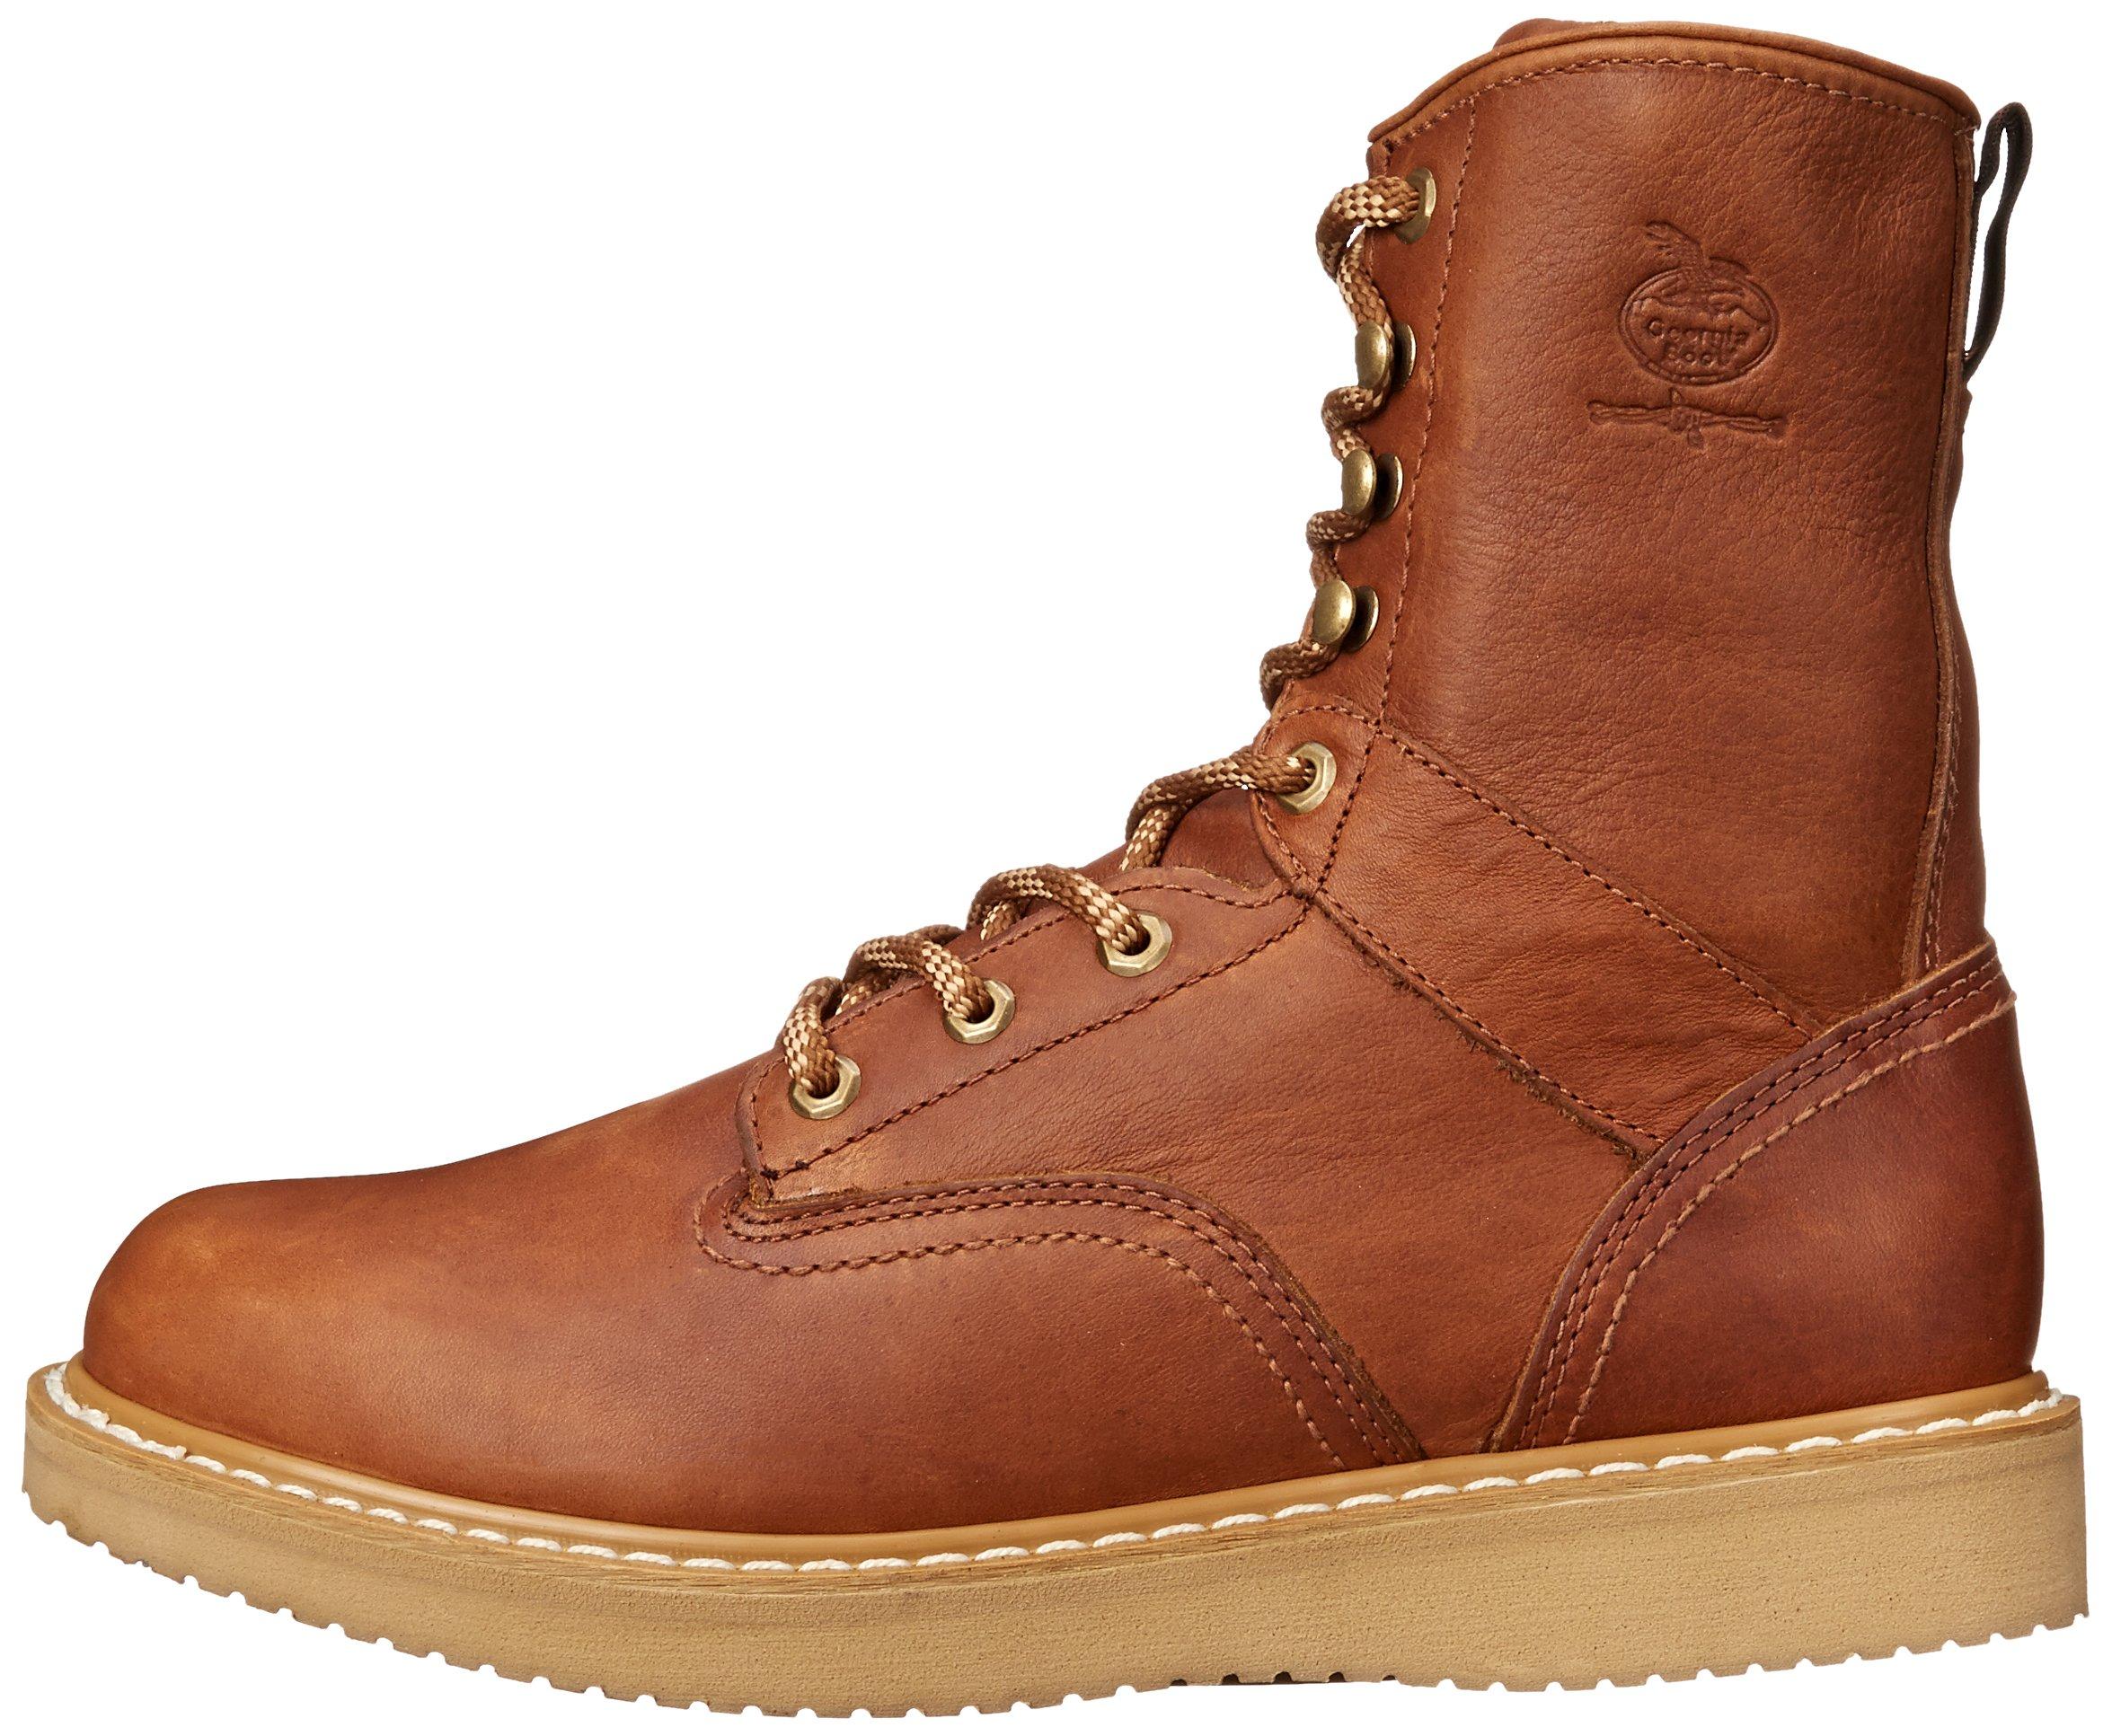 Georgia Boot Men's 8 Inch Wedge Work Shoe, Barracuda Gold, 12 W US by Georgia (Image #5)